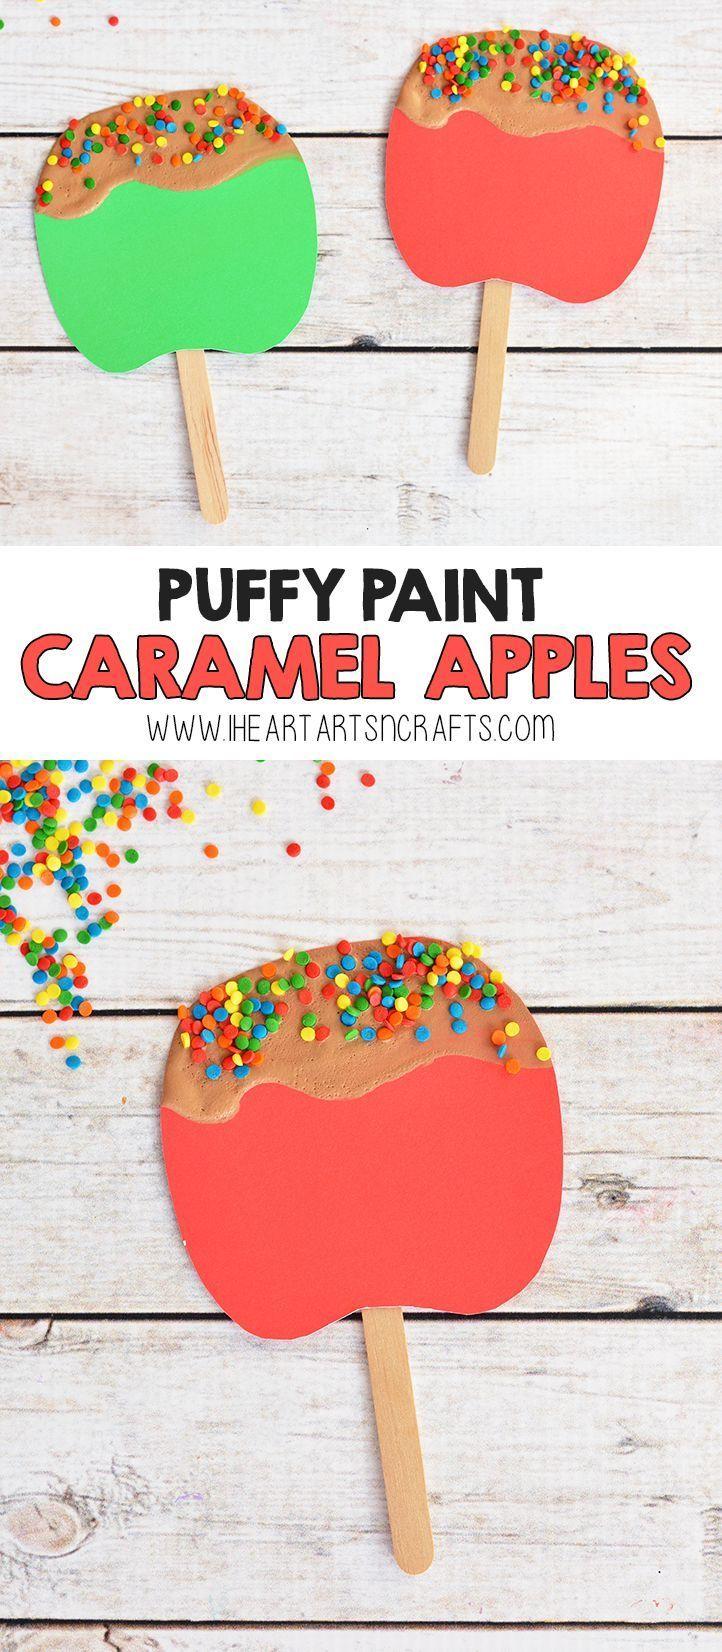 Puffy Paint Caramel Apple Craft For Kids Fun Activities